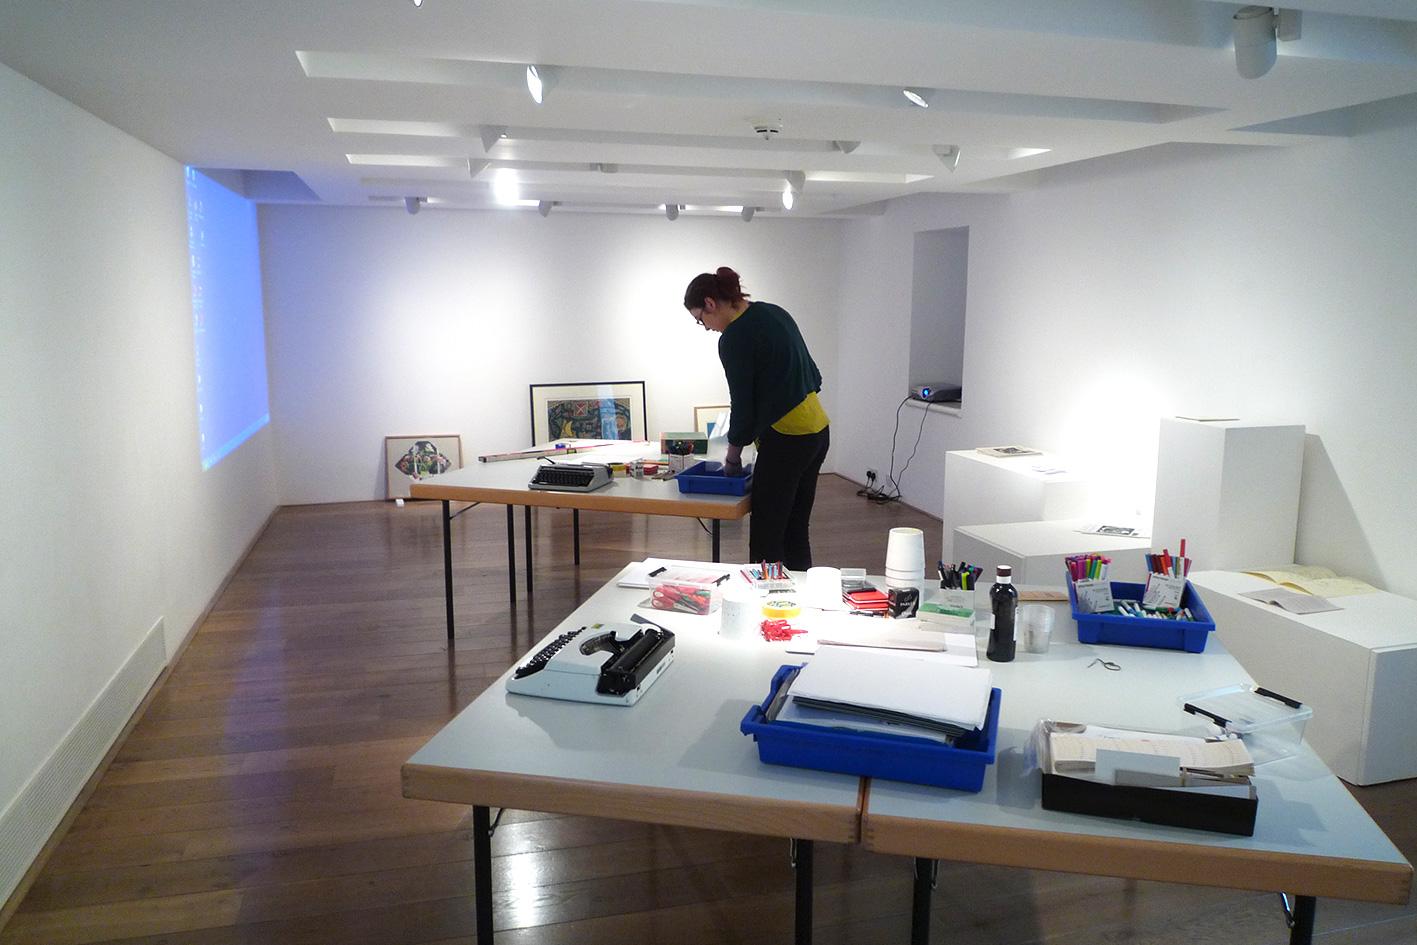 zine-workshop-set-up.jpg